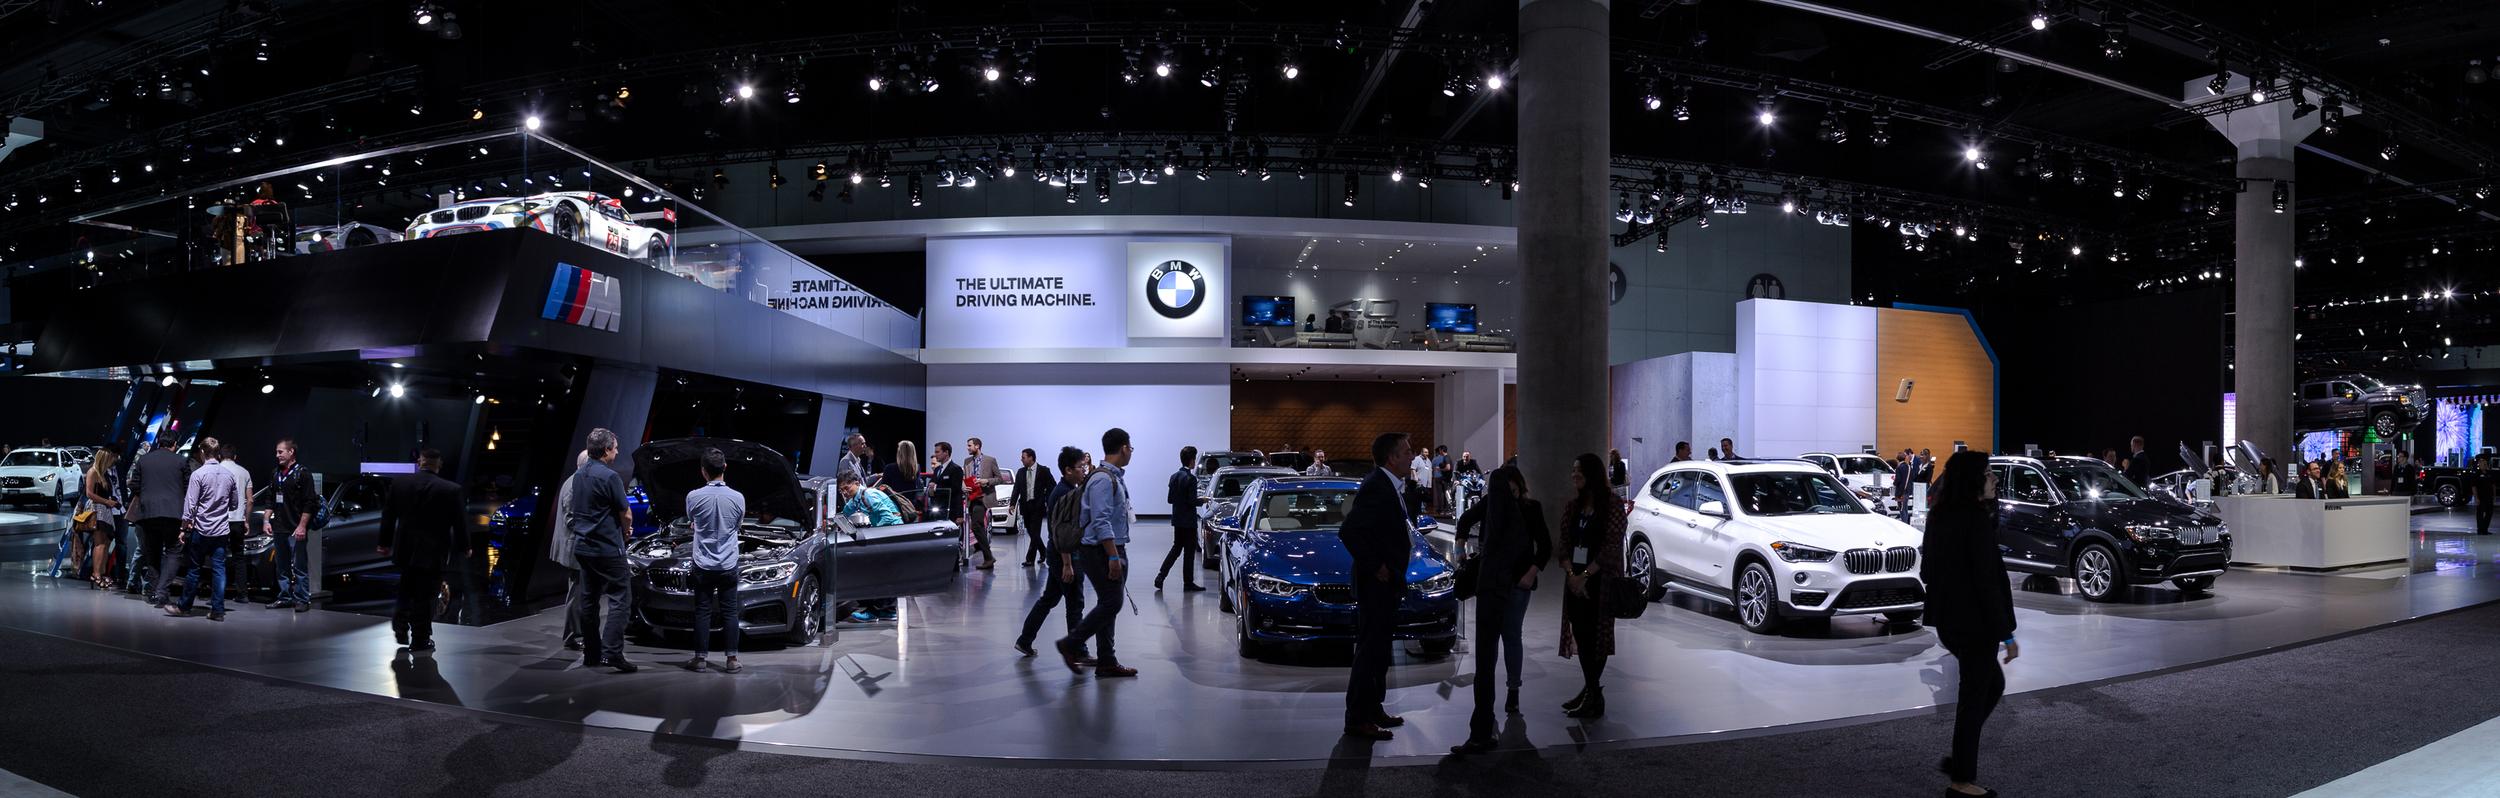 BMW 2015 (2 of 3).jpg